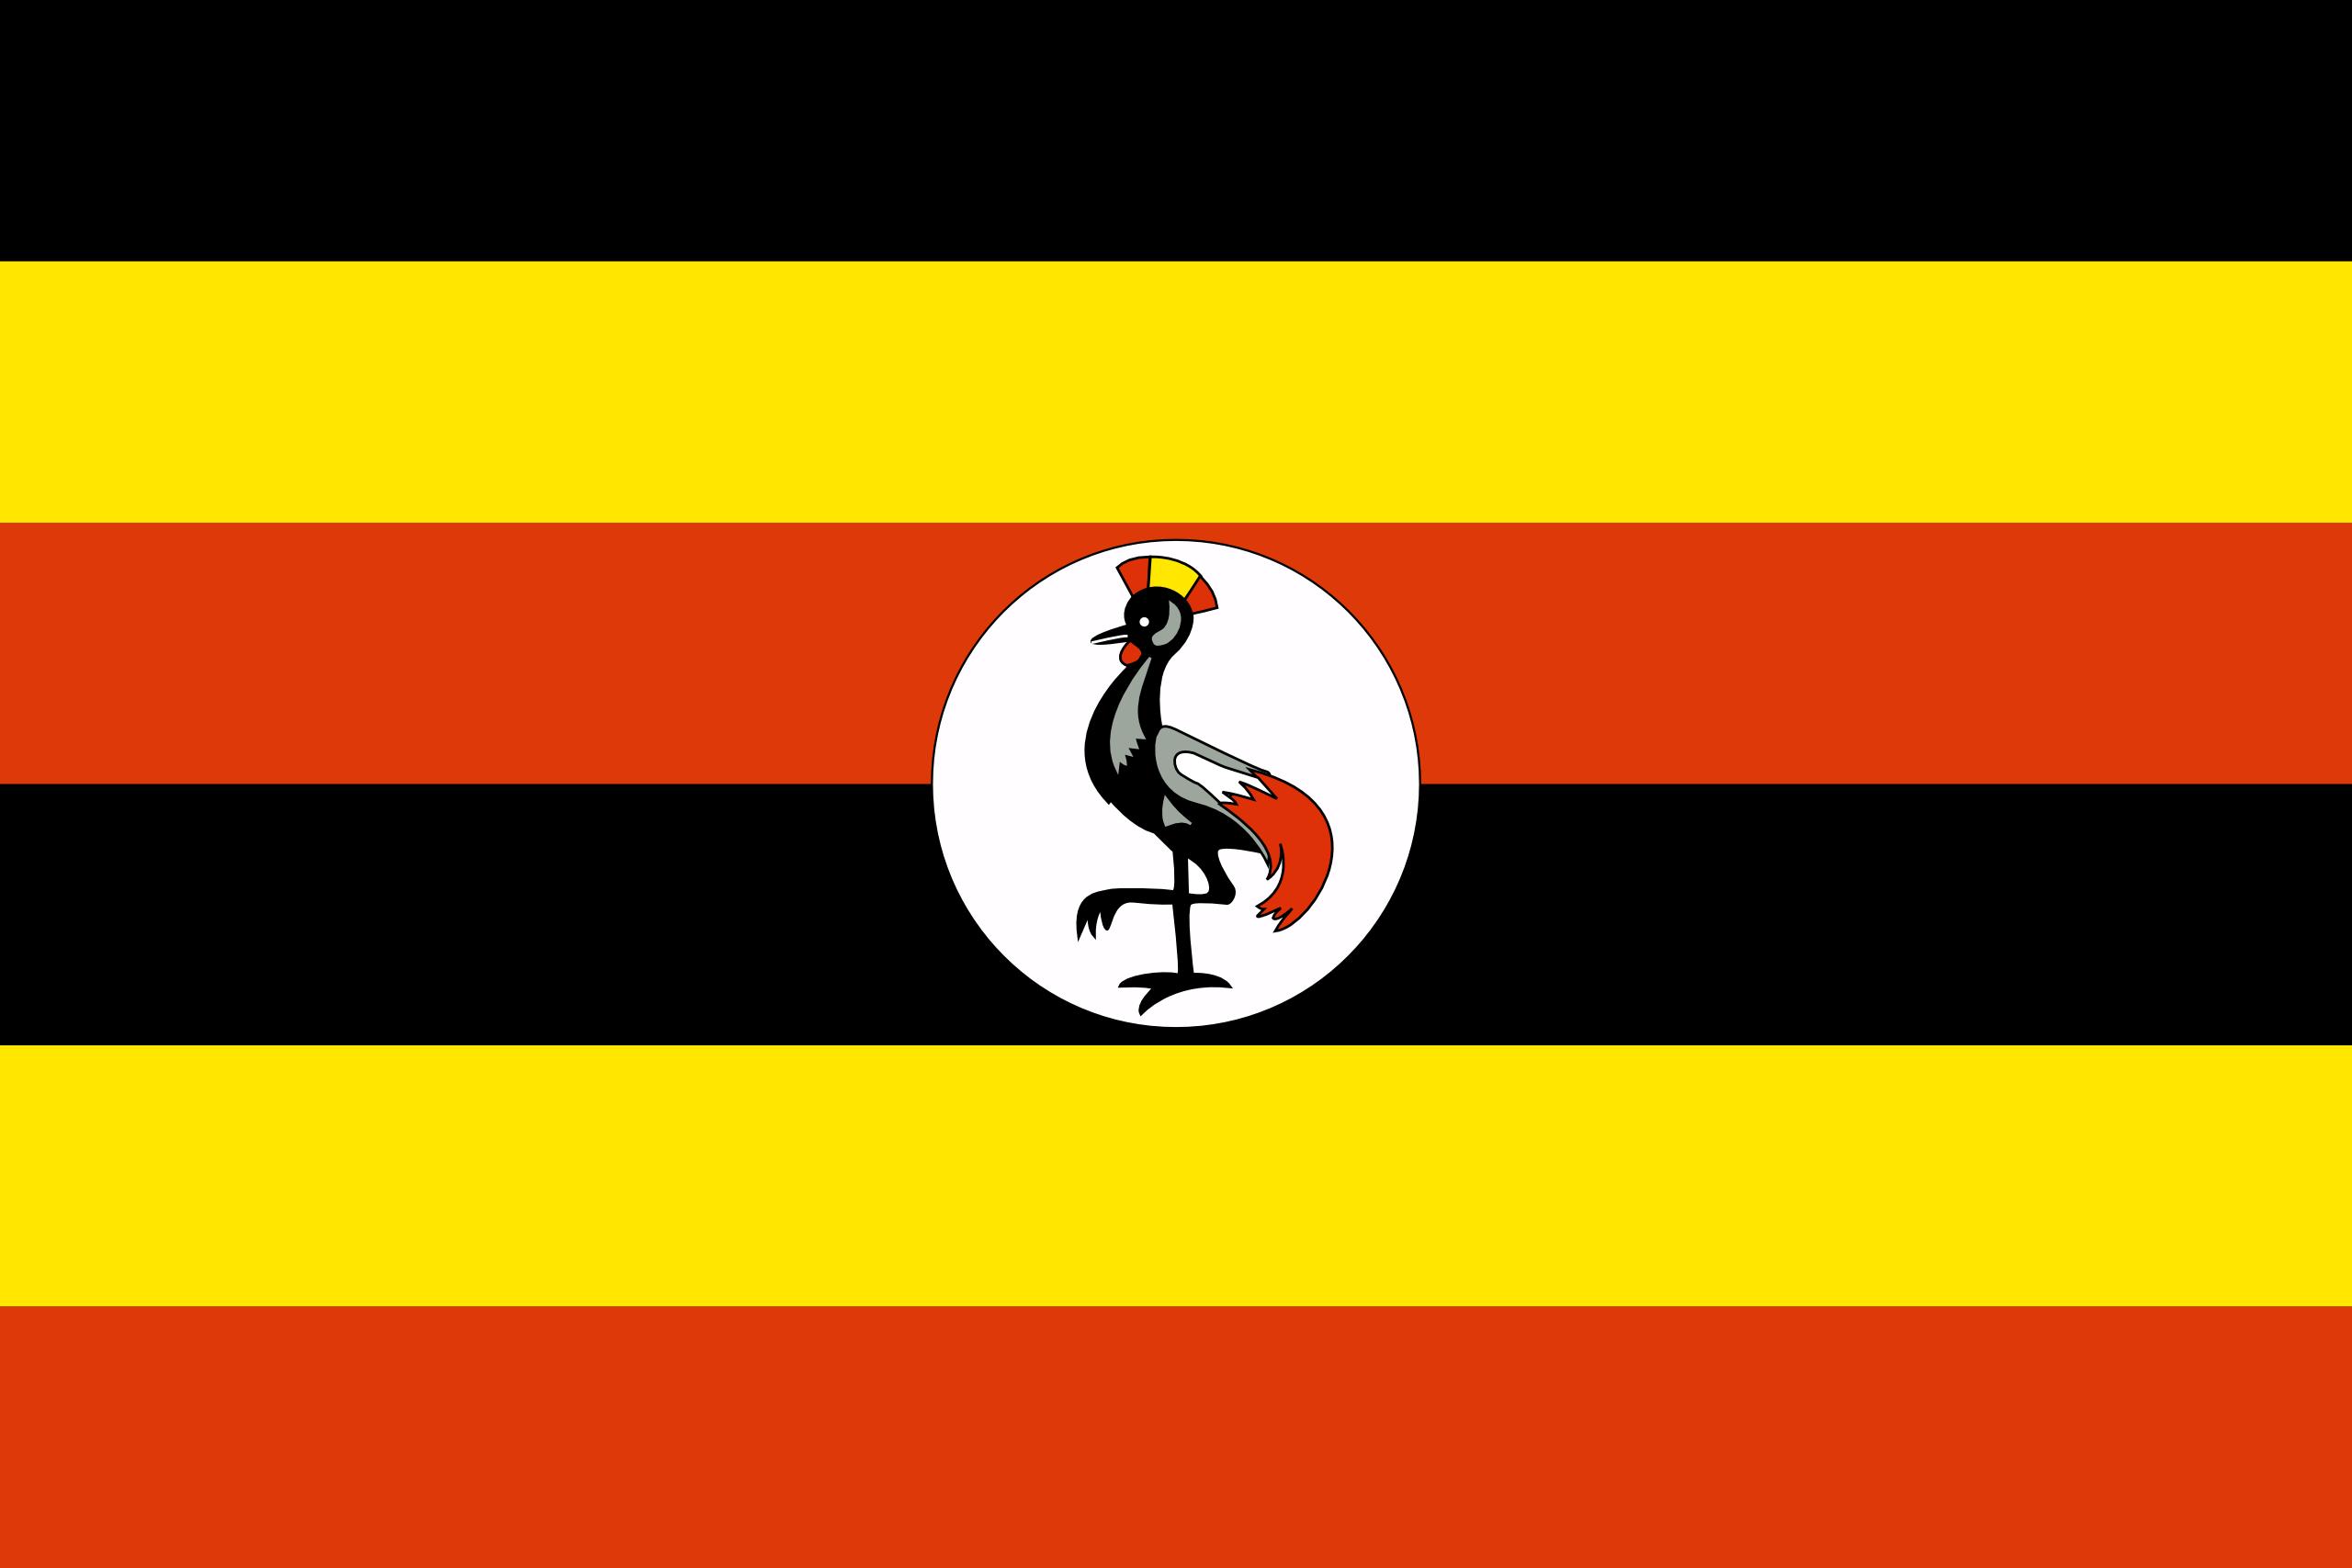 uganda, страна, Эмблема, логотип, символ - Обои HD - Профессор falken.com